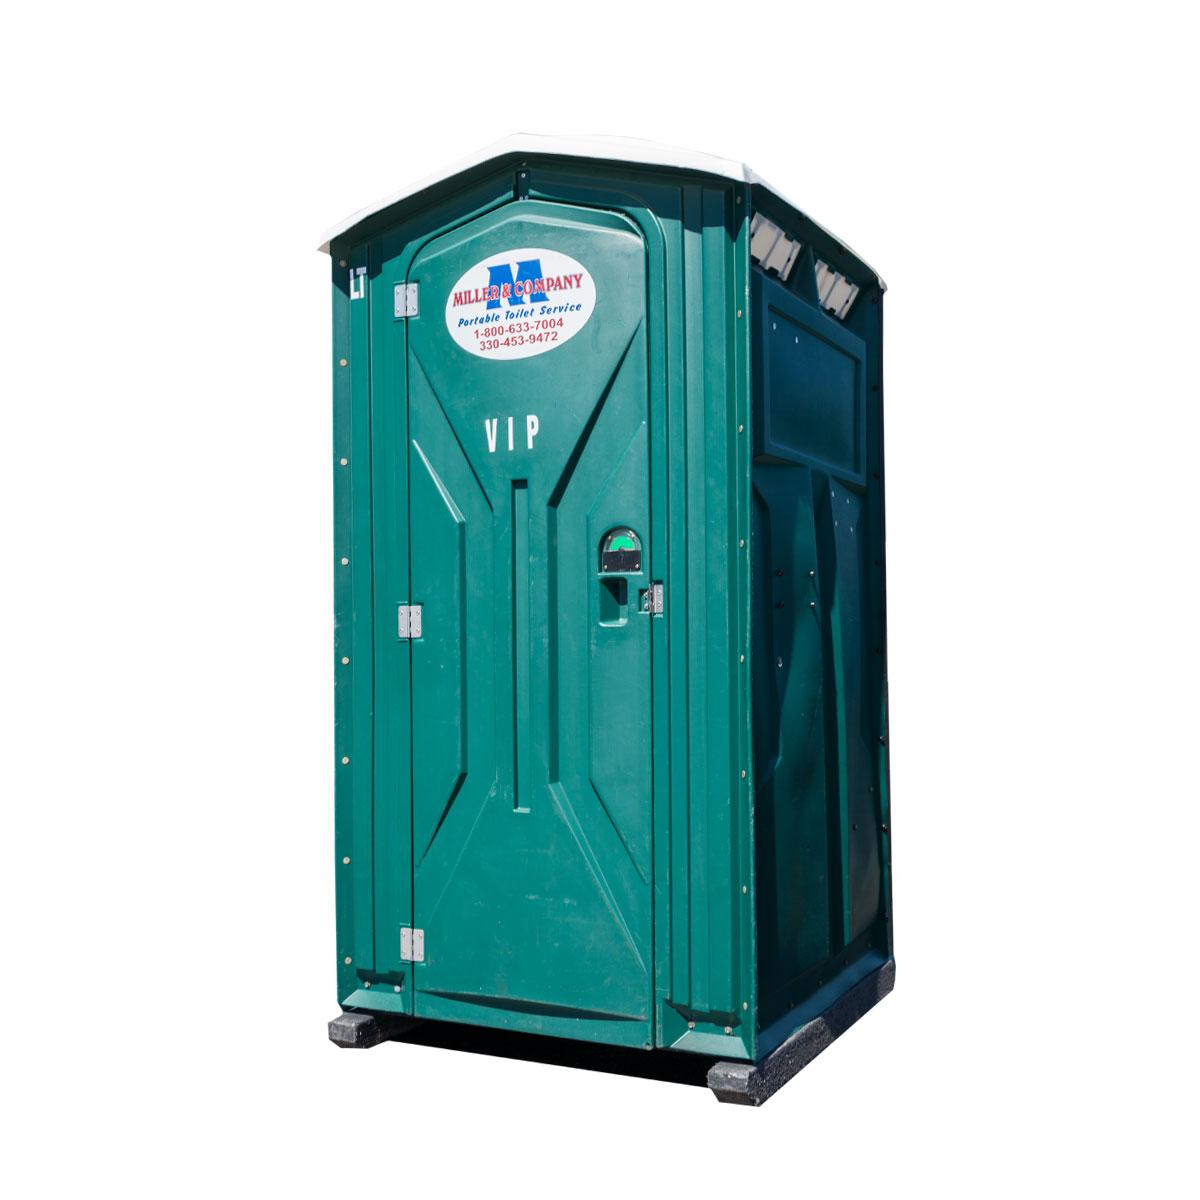 Porta potty clipart 4 » Clipart Station.